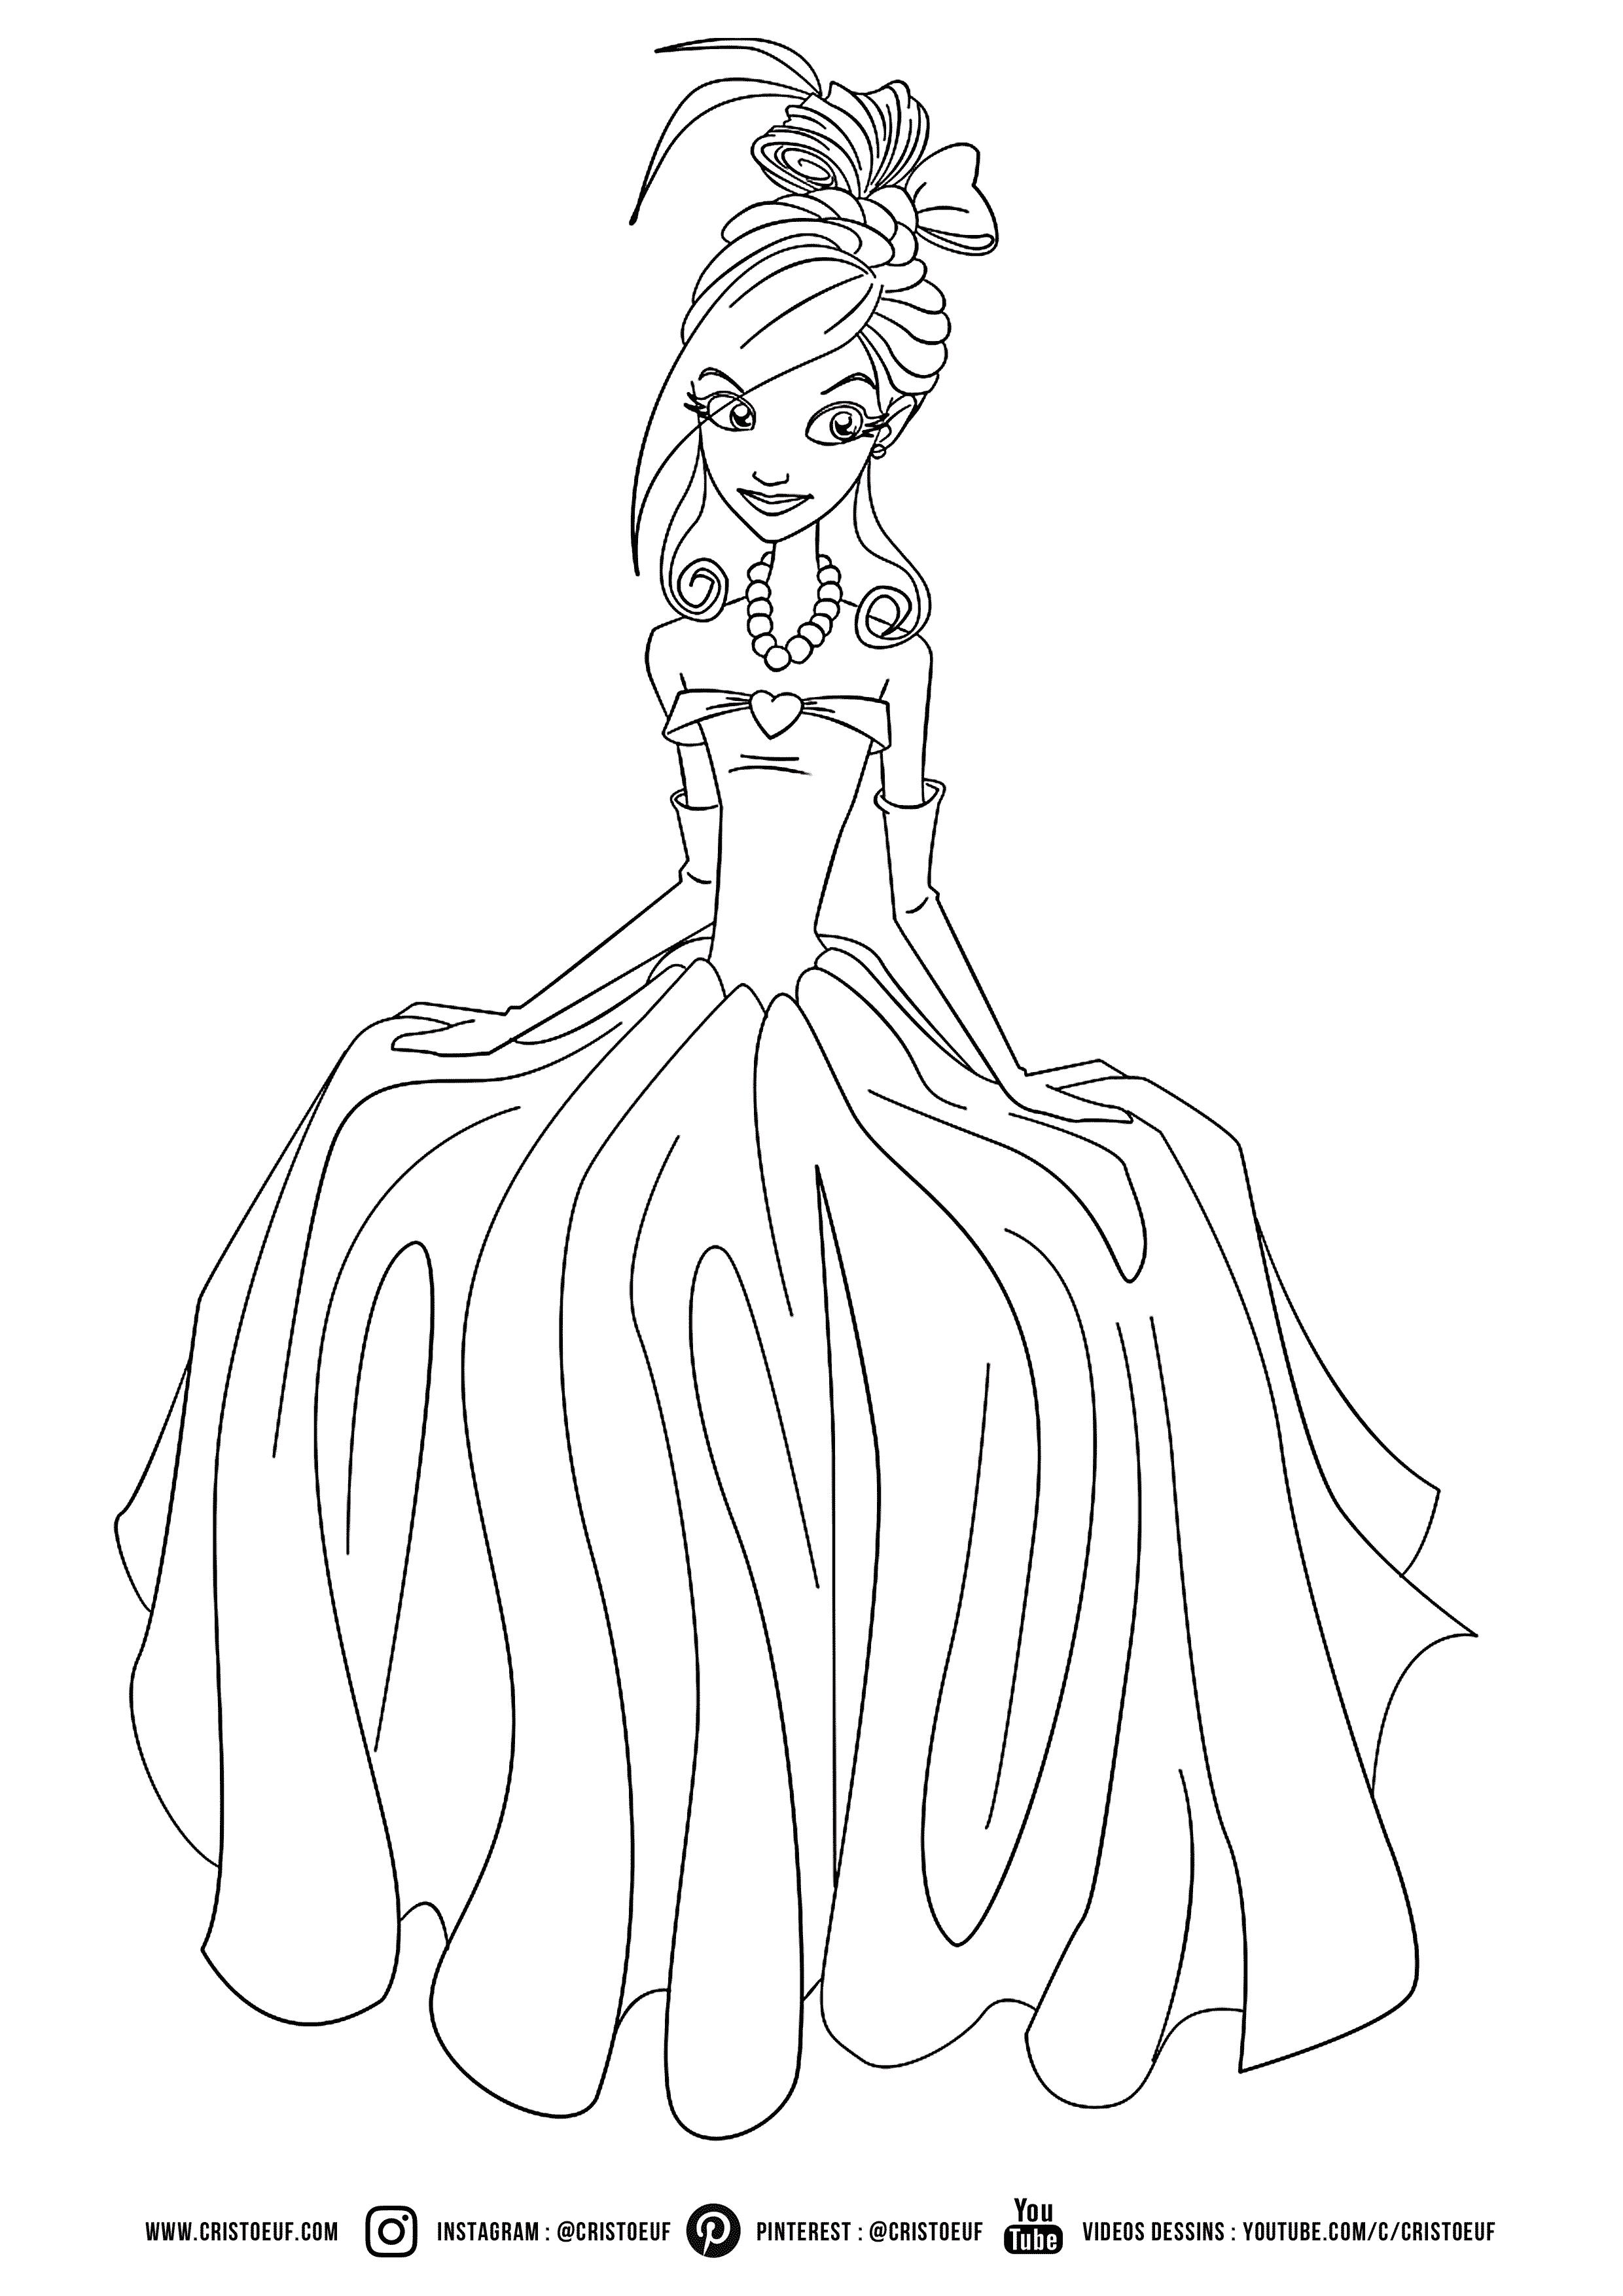 coloriage #princess #disney #princesses #girl #cute #dress #beauty